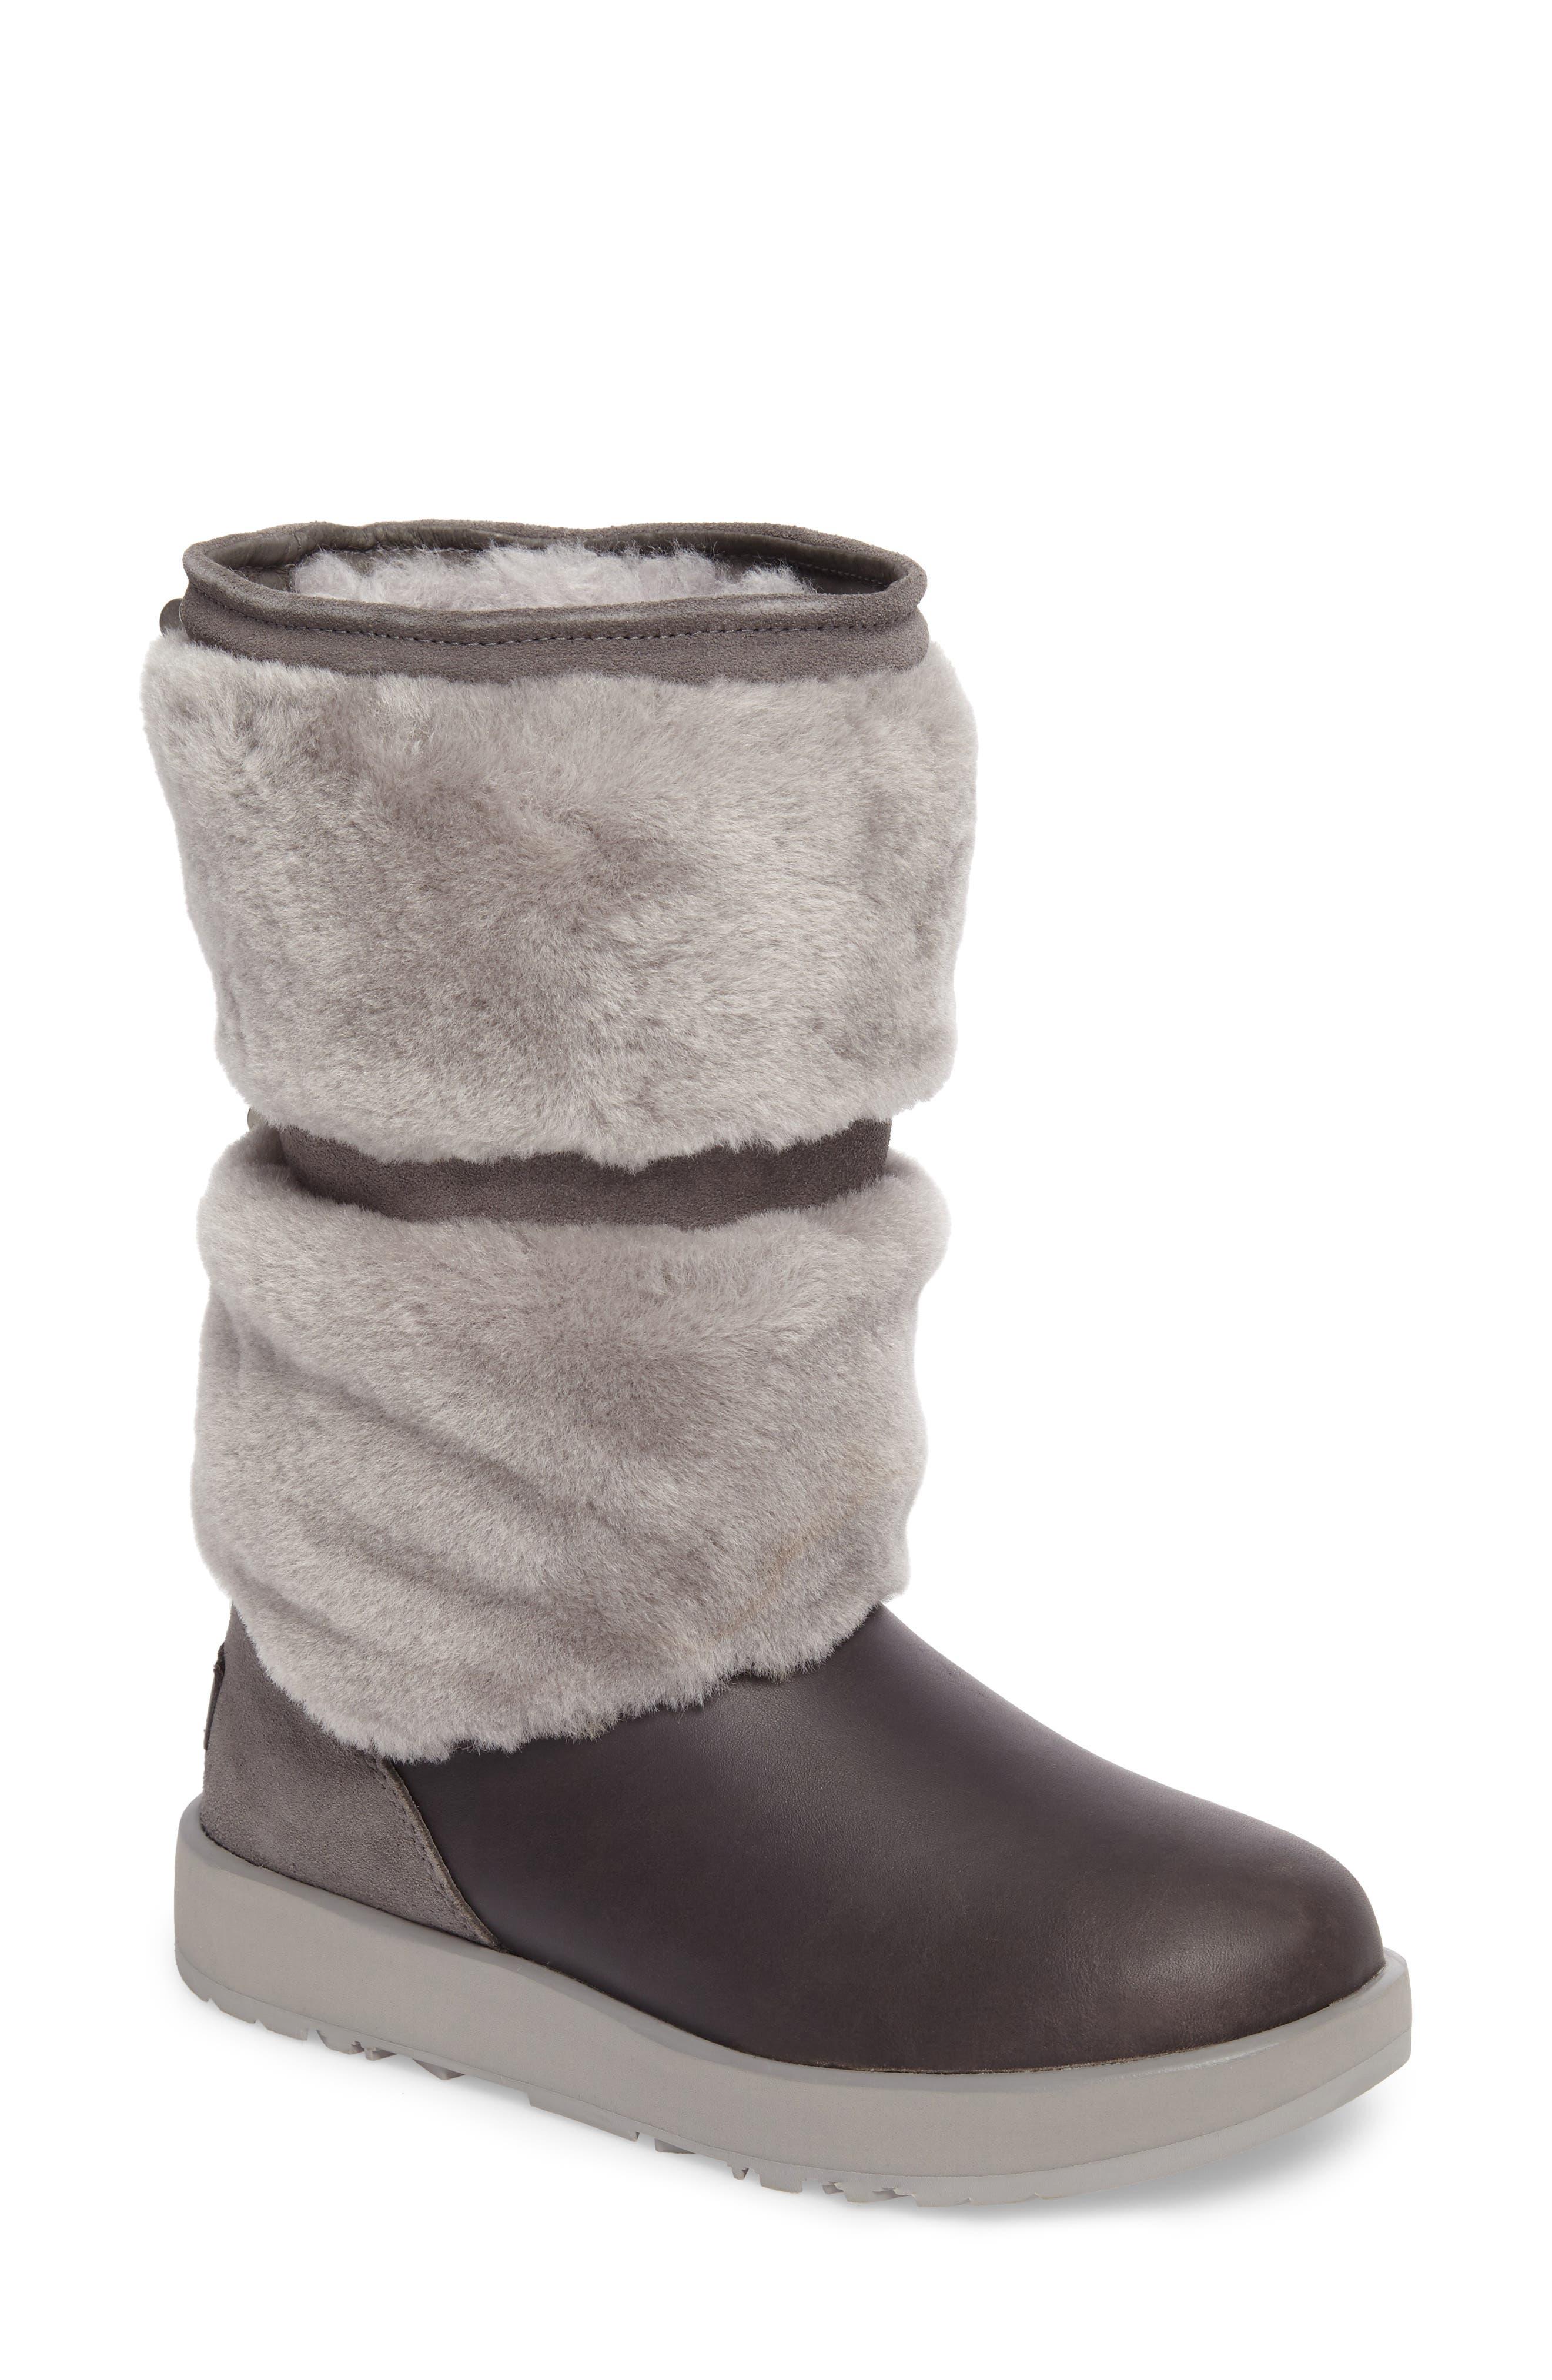 Main Image - UGG® Reykir Waterproof Snow Boot (Women)